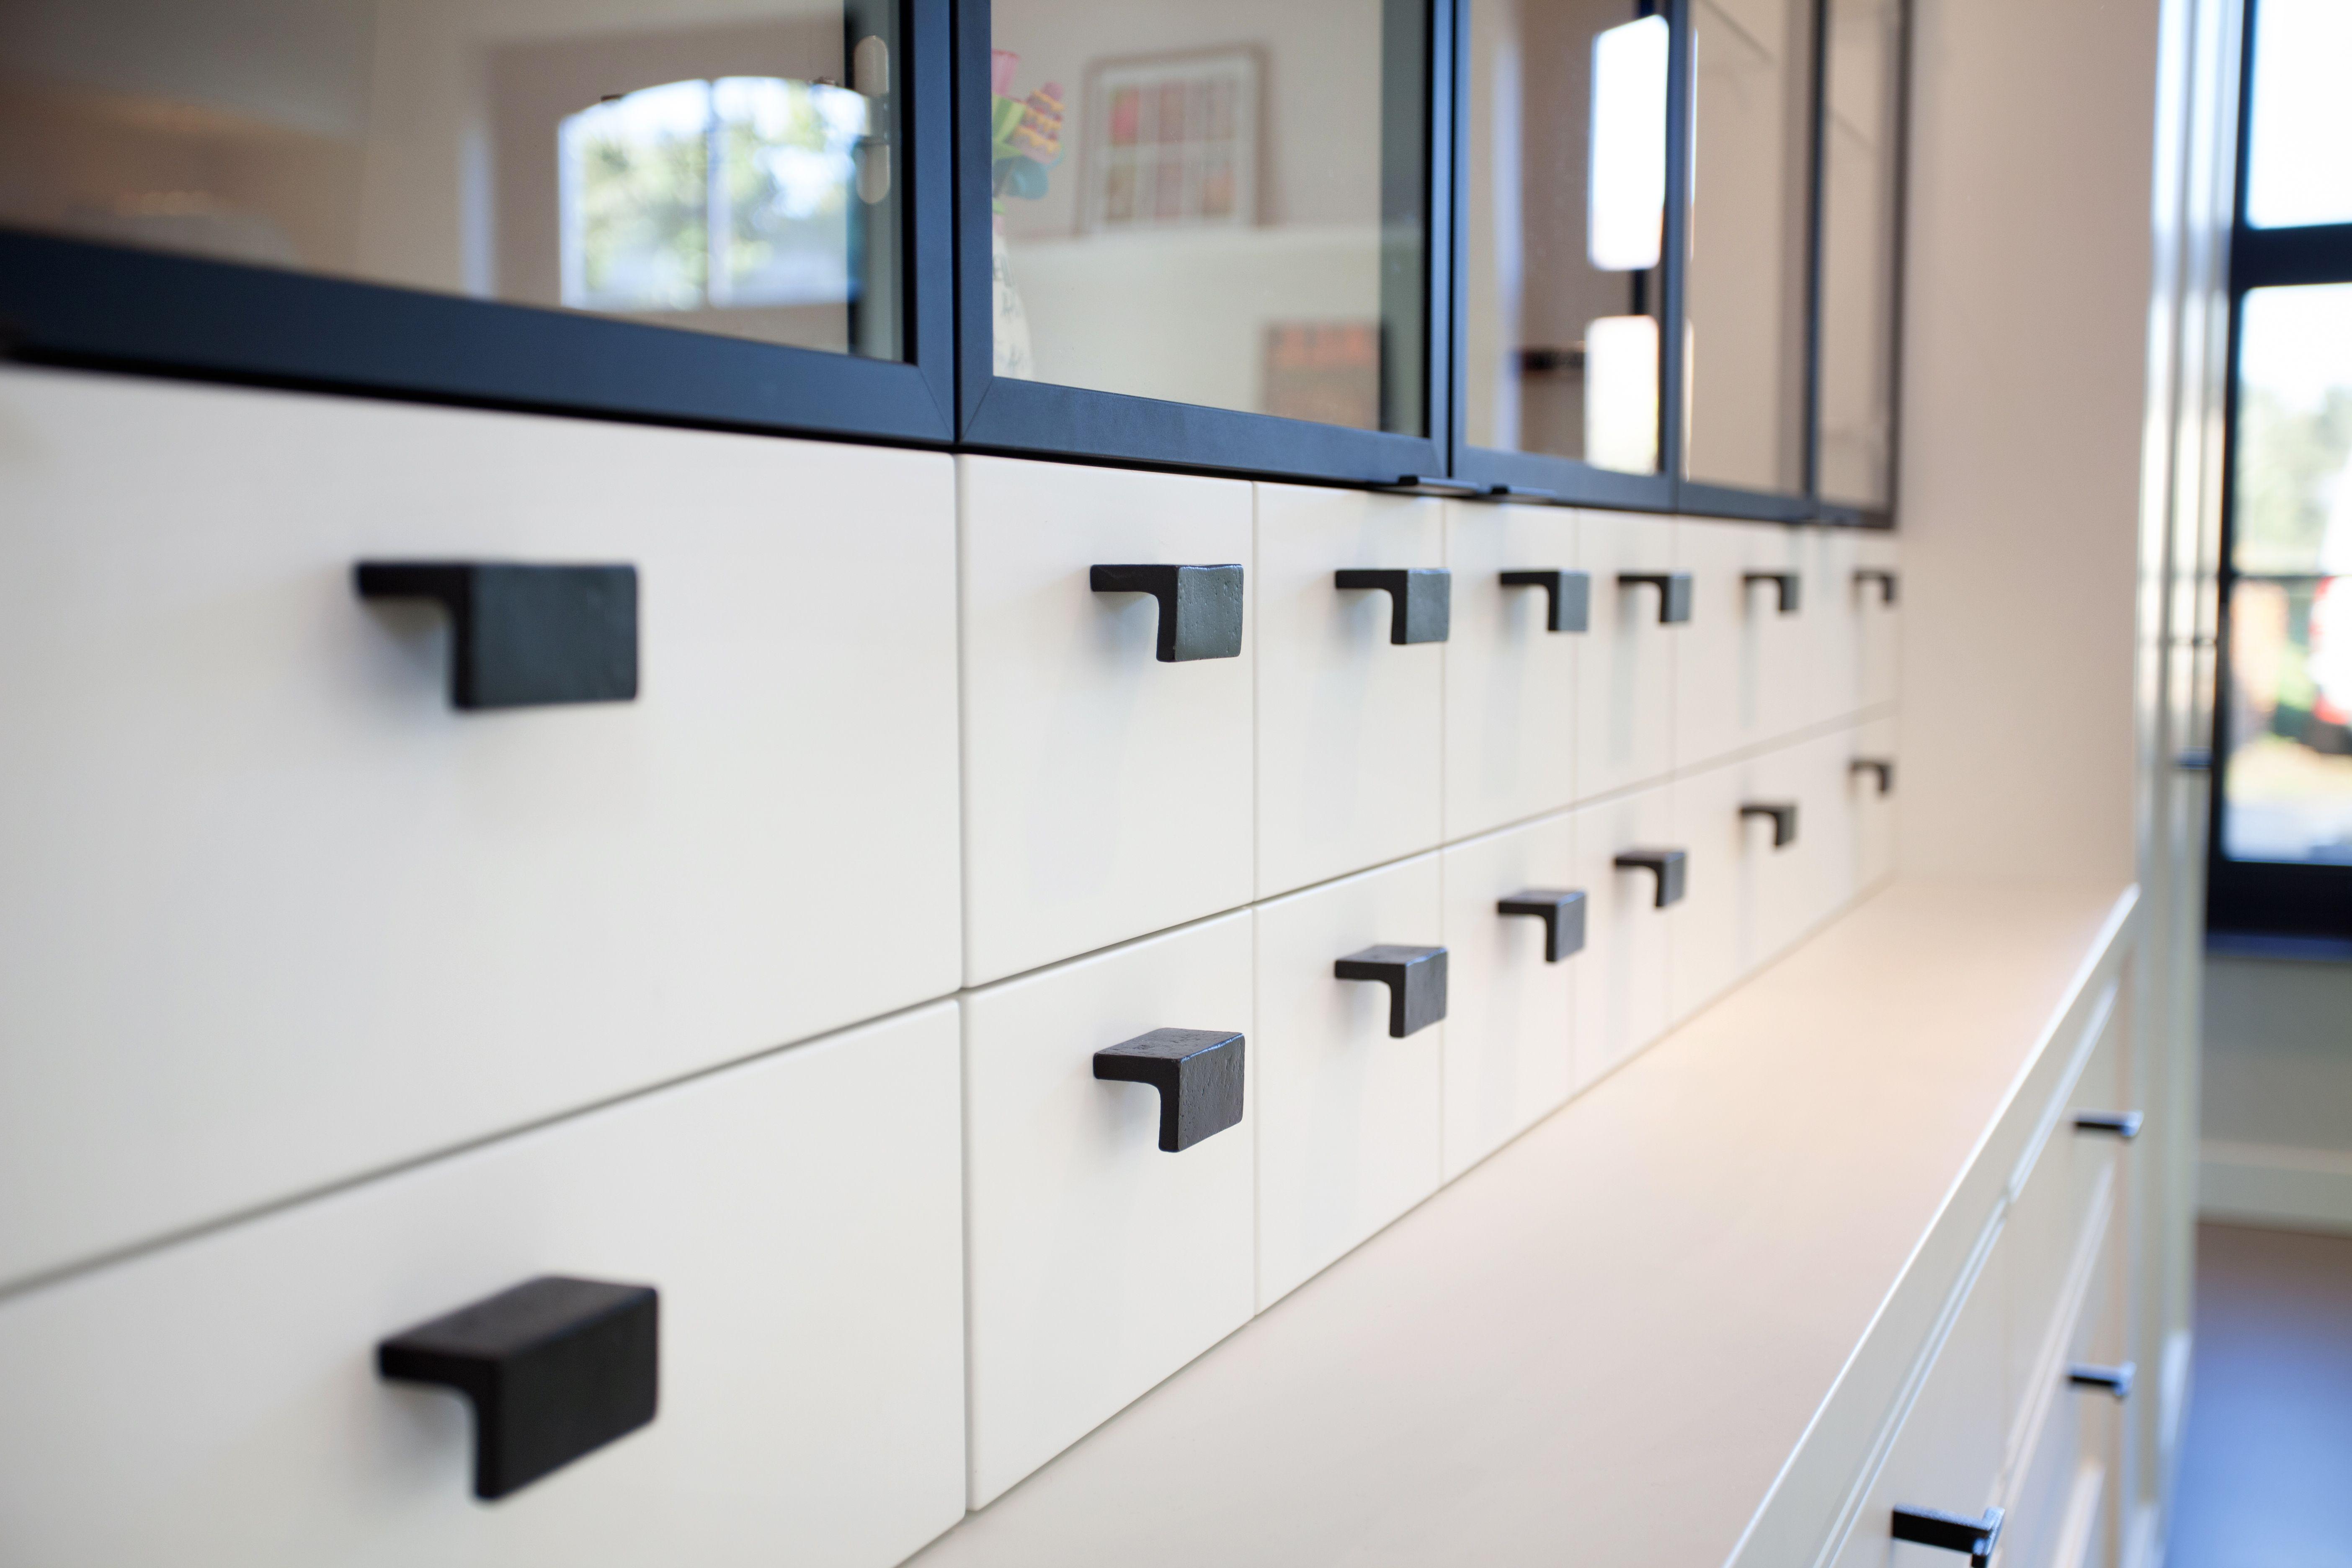 Inloopkast Knsm Loft : Strakk total interior kitchen strakk total interior in and